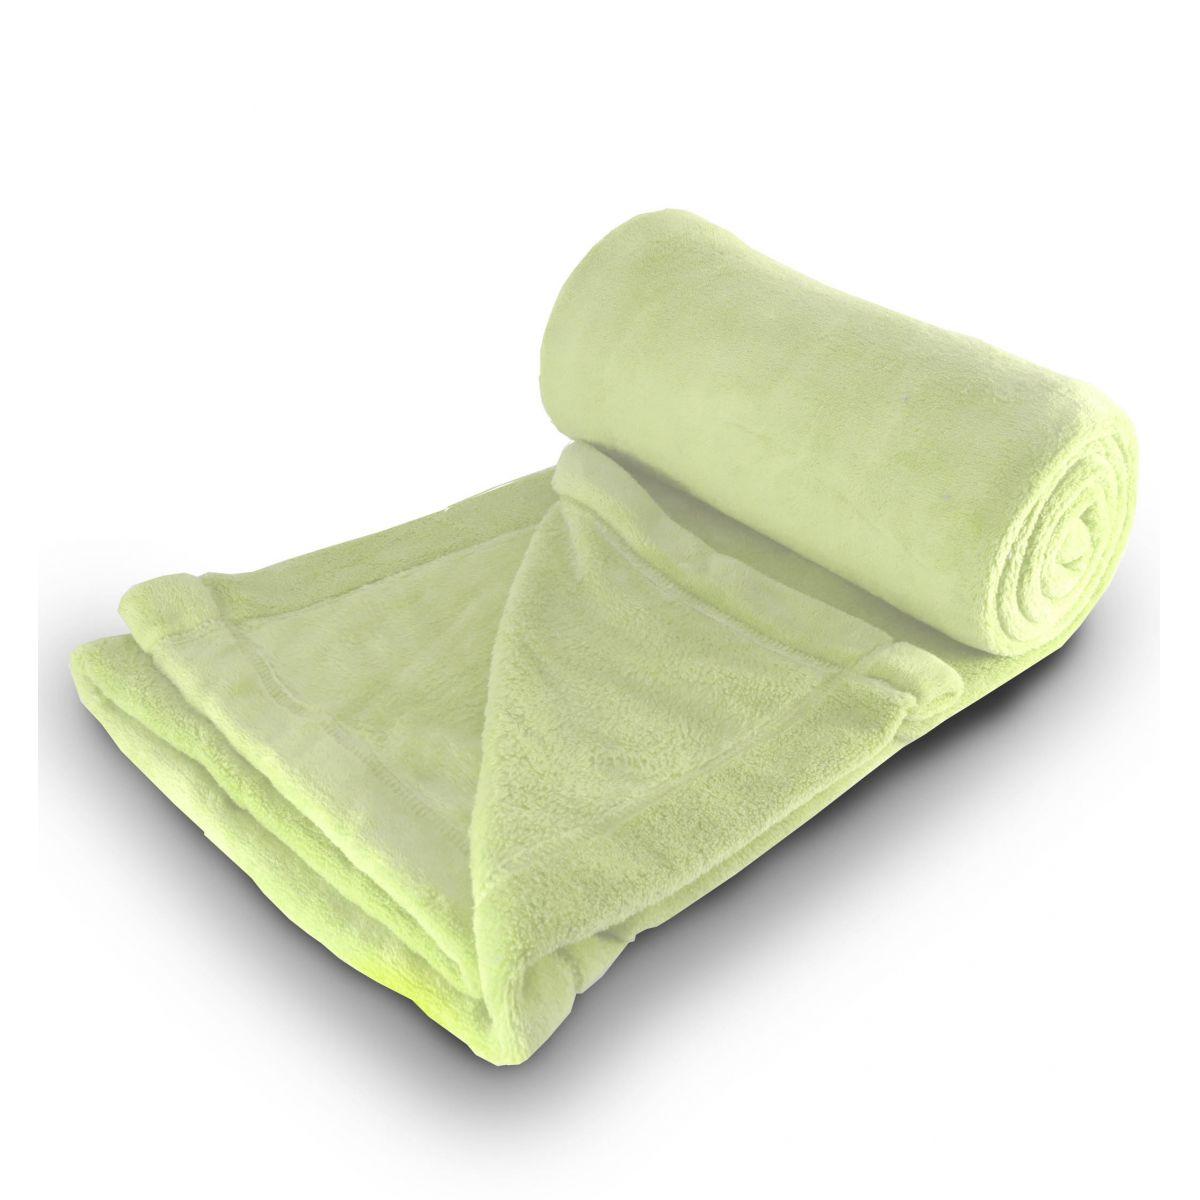 Cobertor de Microfibra 240 g/m³ King - Bege